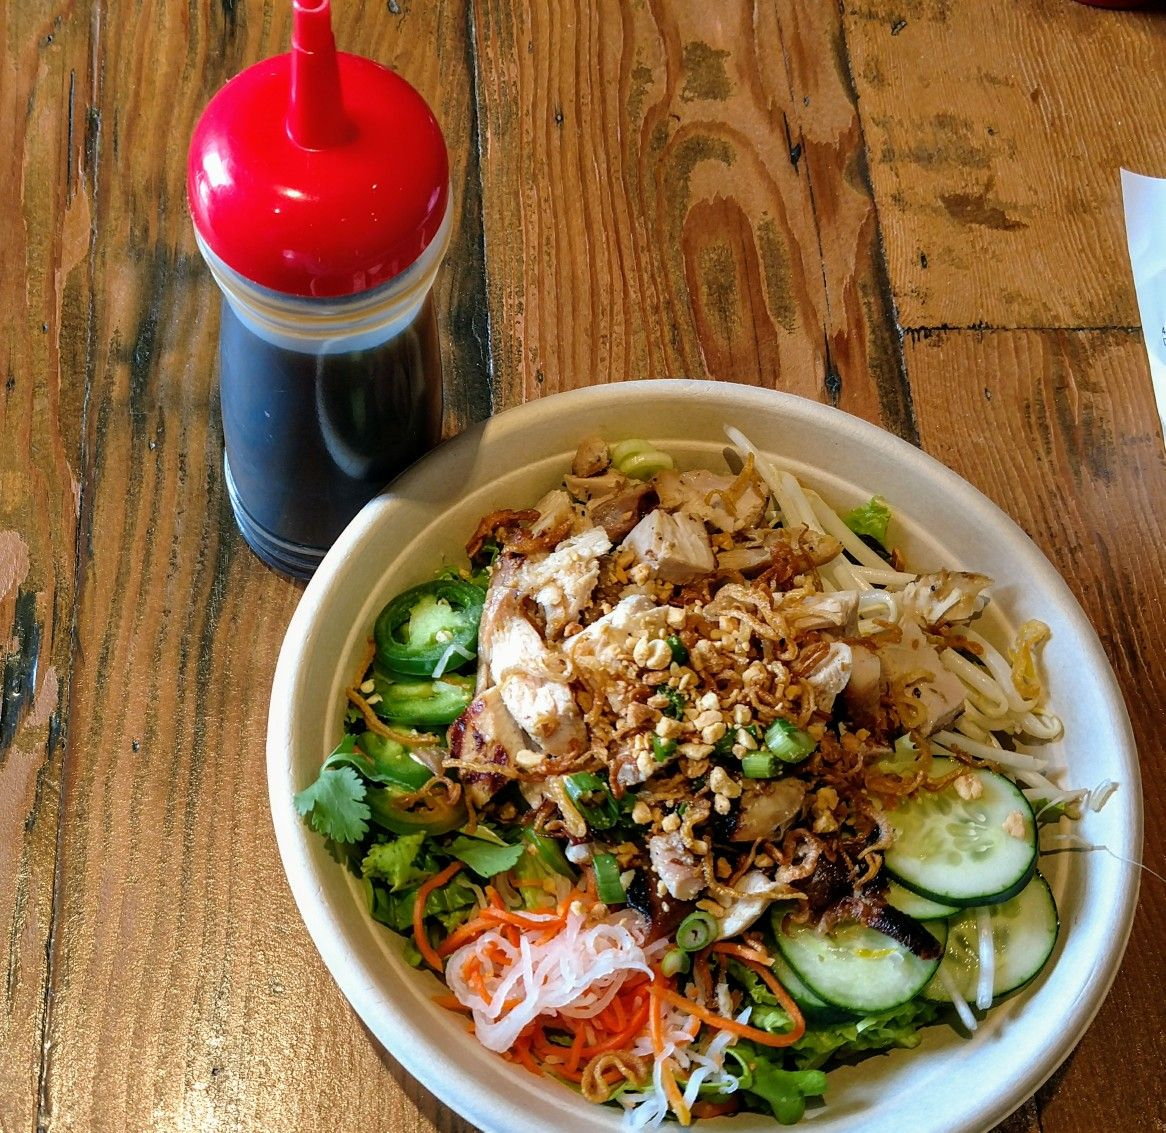 Vn Grill Asian Street Food San Jose California Very Good Food Vegetarian Options Available Asian Street Food Food Vegetarian Options